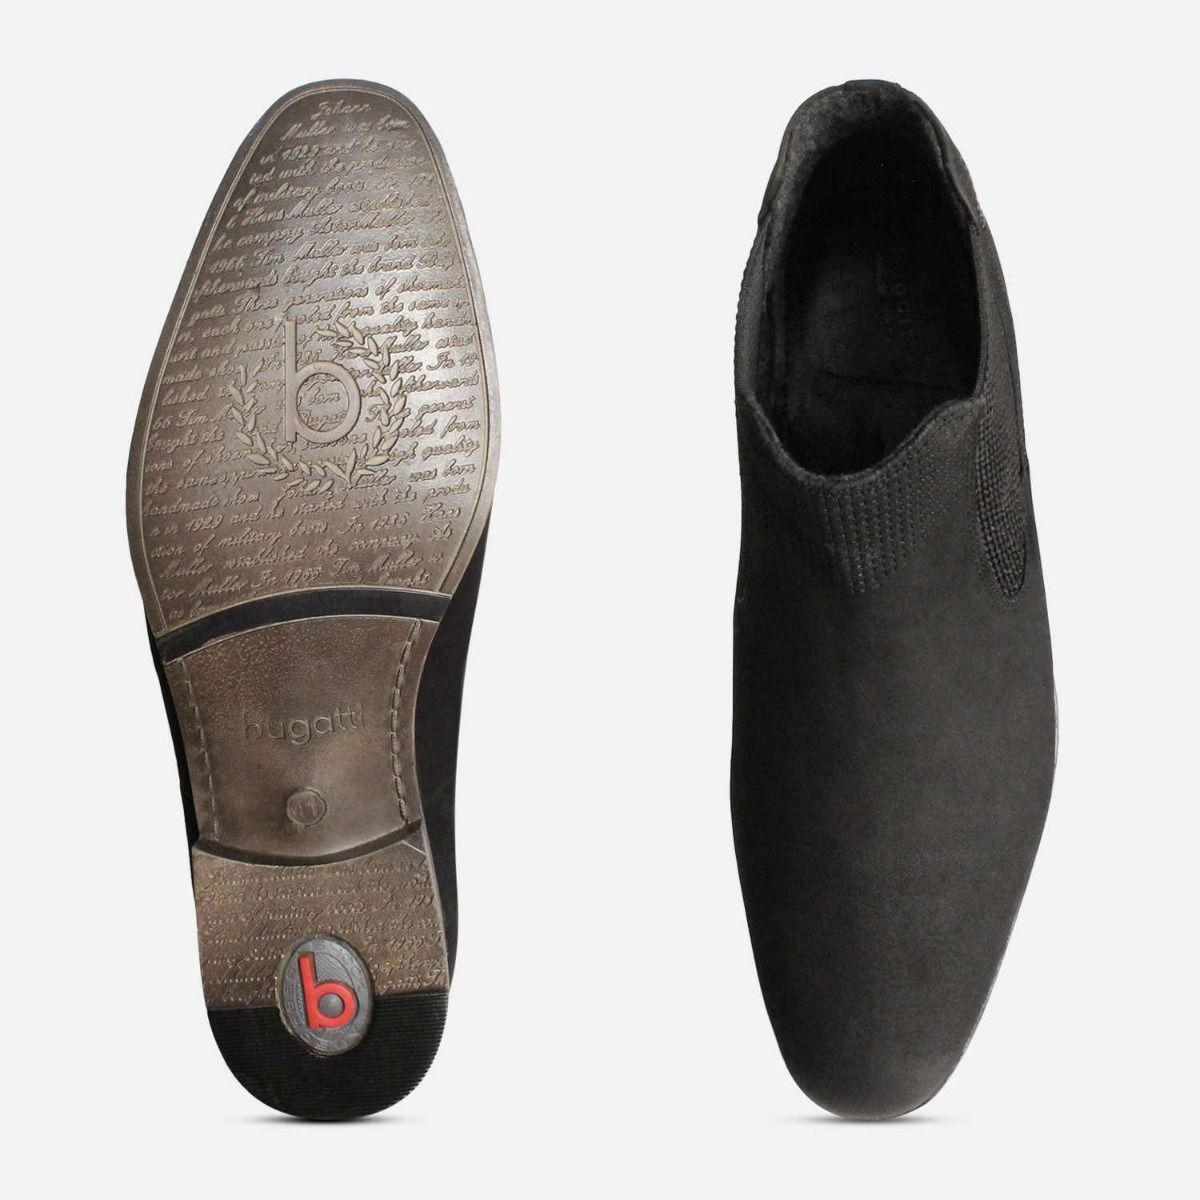 Matt Black Nubuck Leather Bugatti Beatle Boots for Men